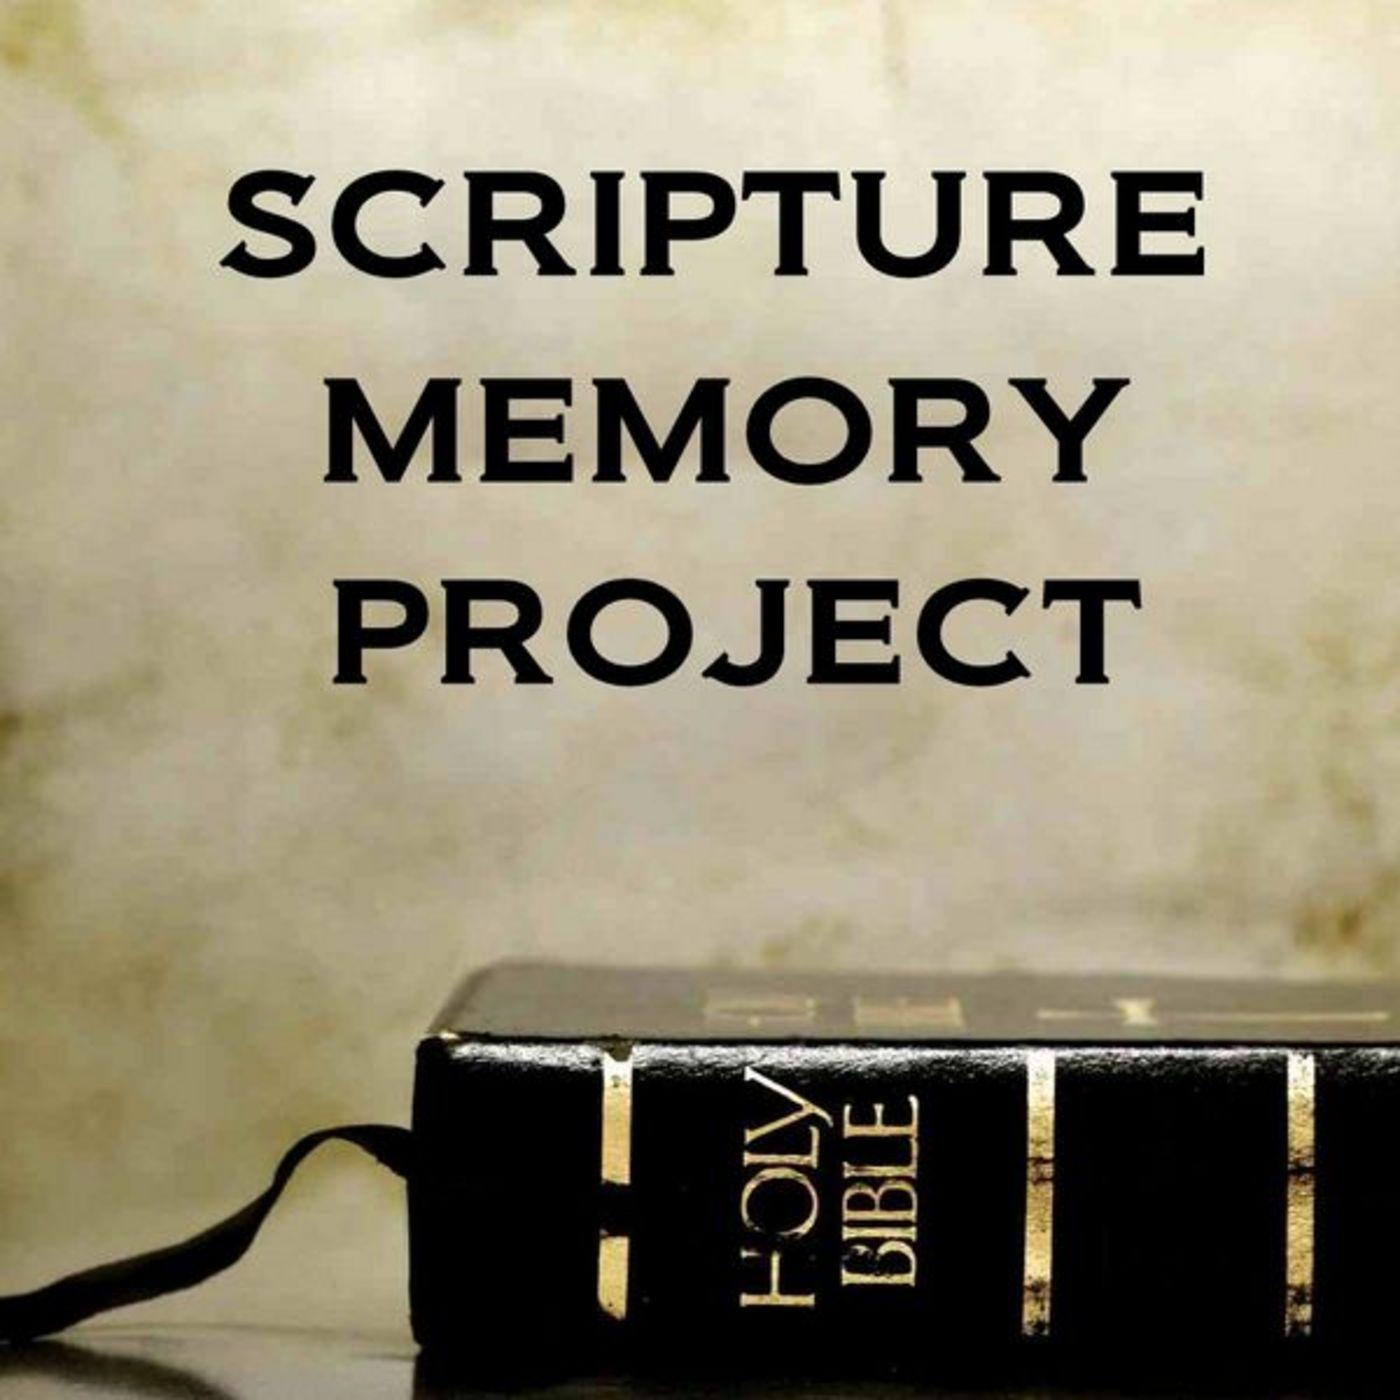 <![CDATA[Scripture Memory Project]]>